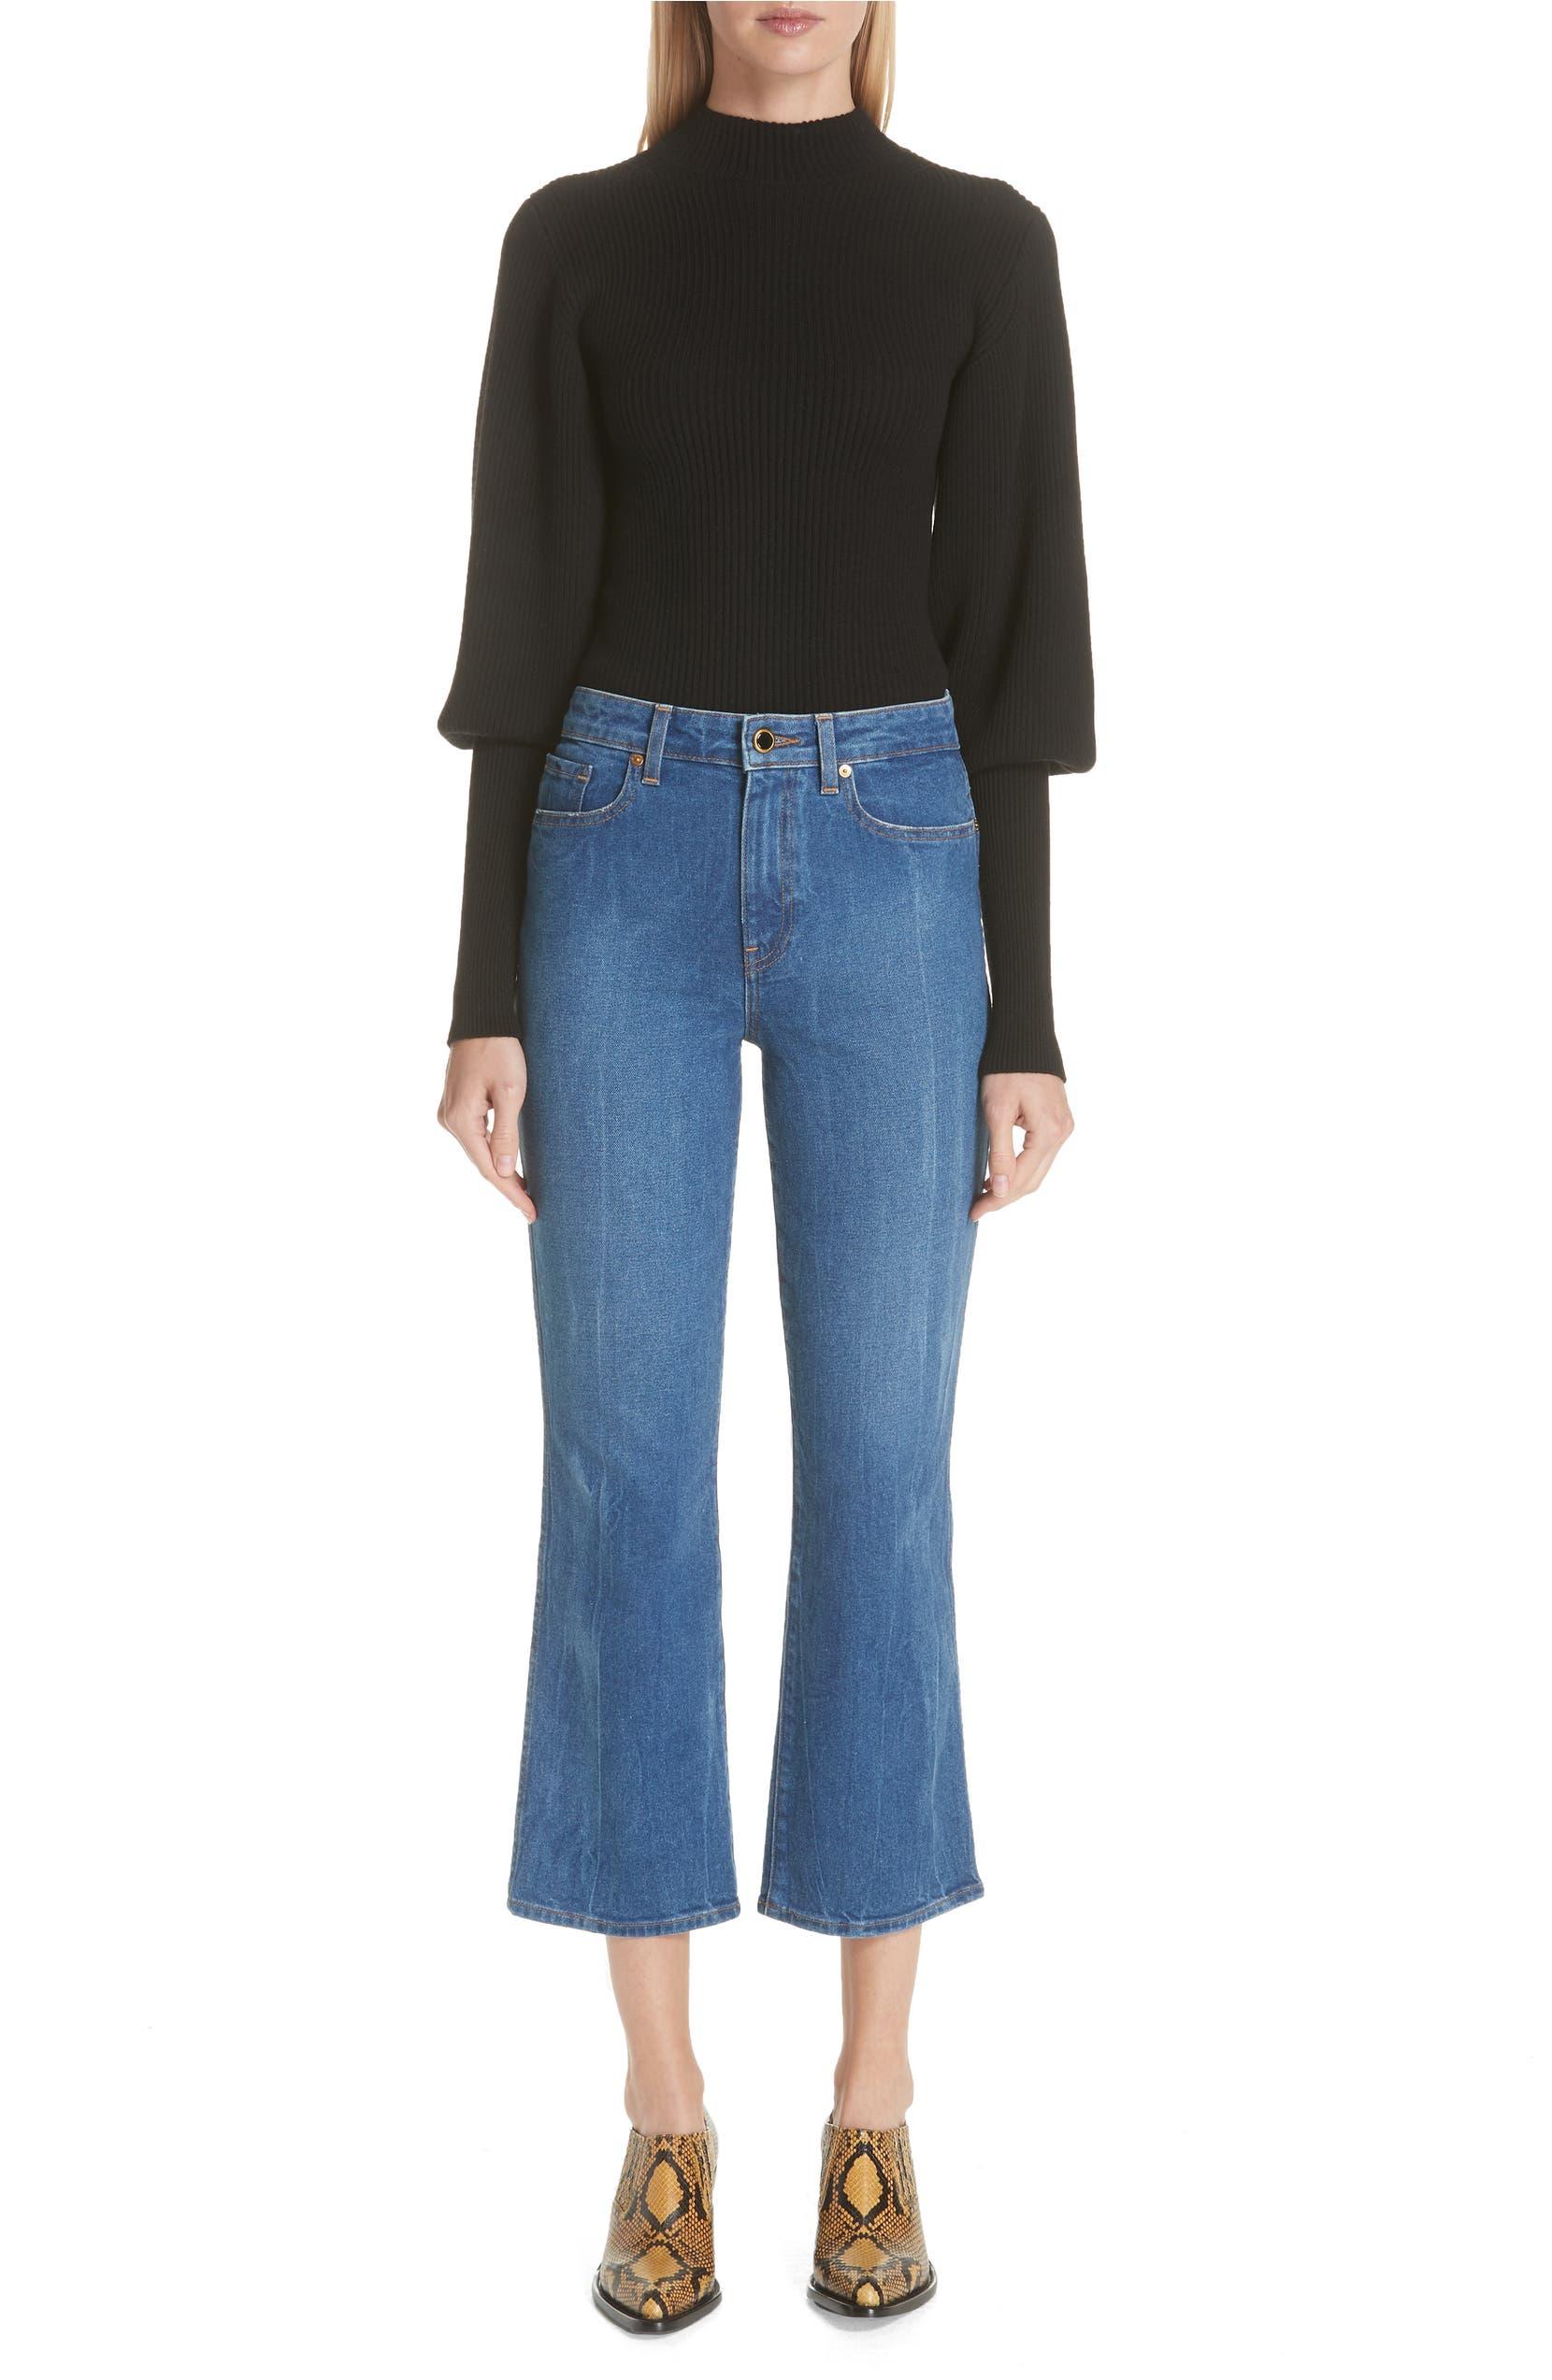 ab98dca8914 Khaite Benny Crop Flare Jeans